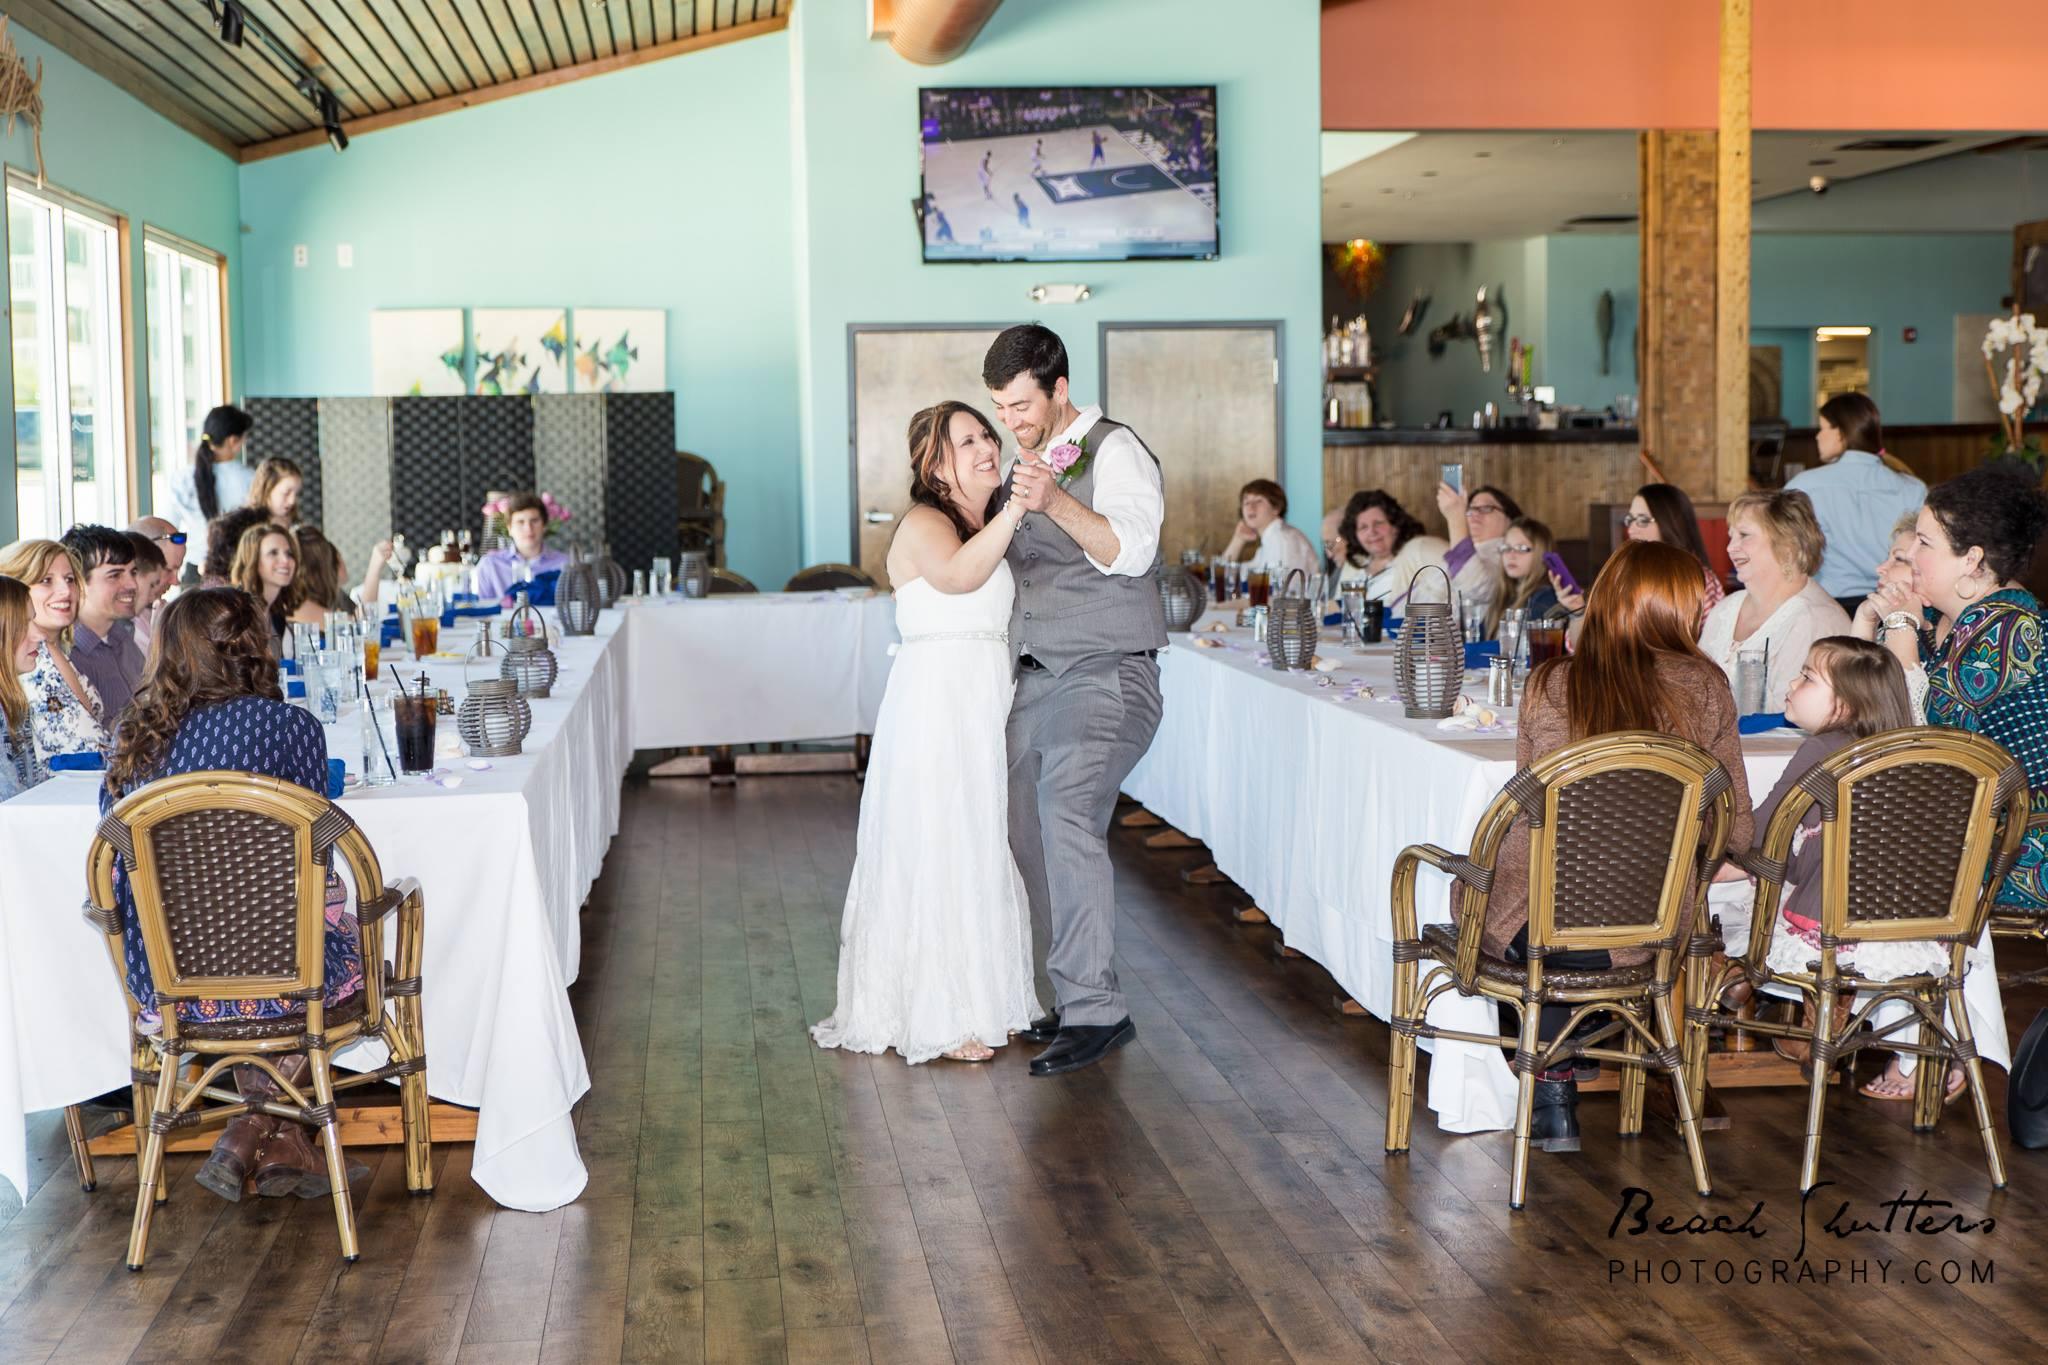 Orange Beach Wedding Photographer at the reception